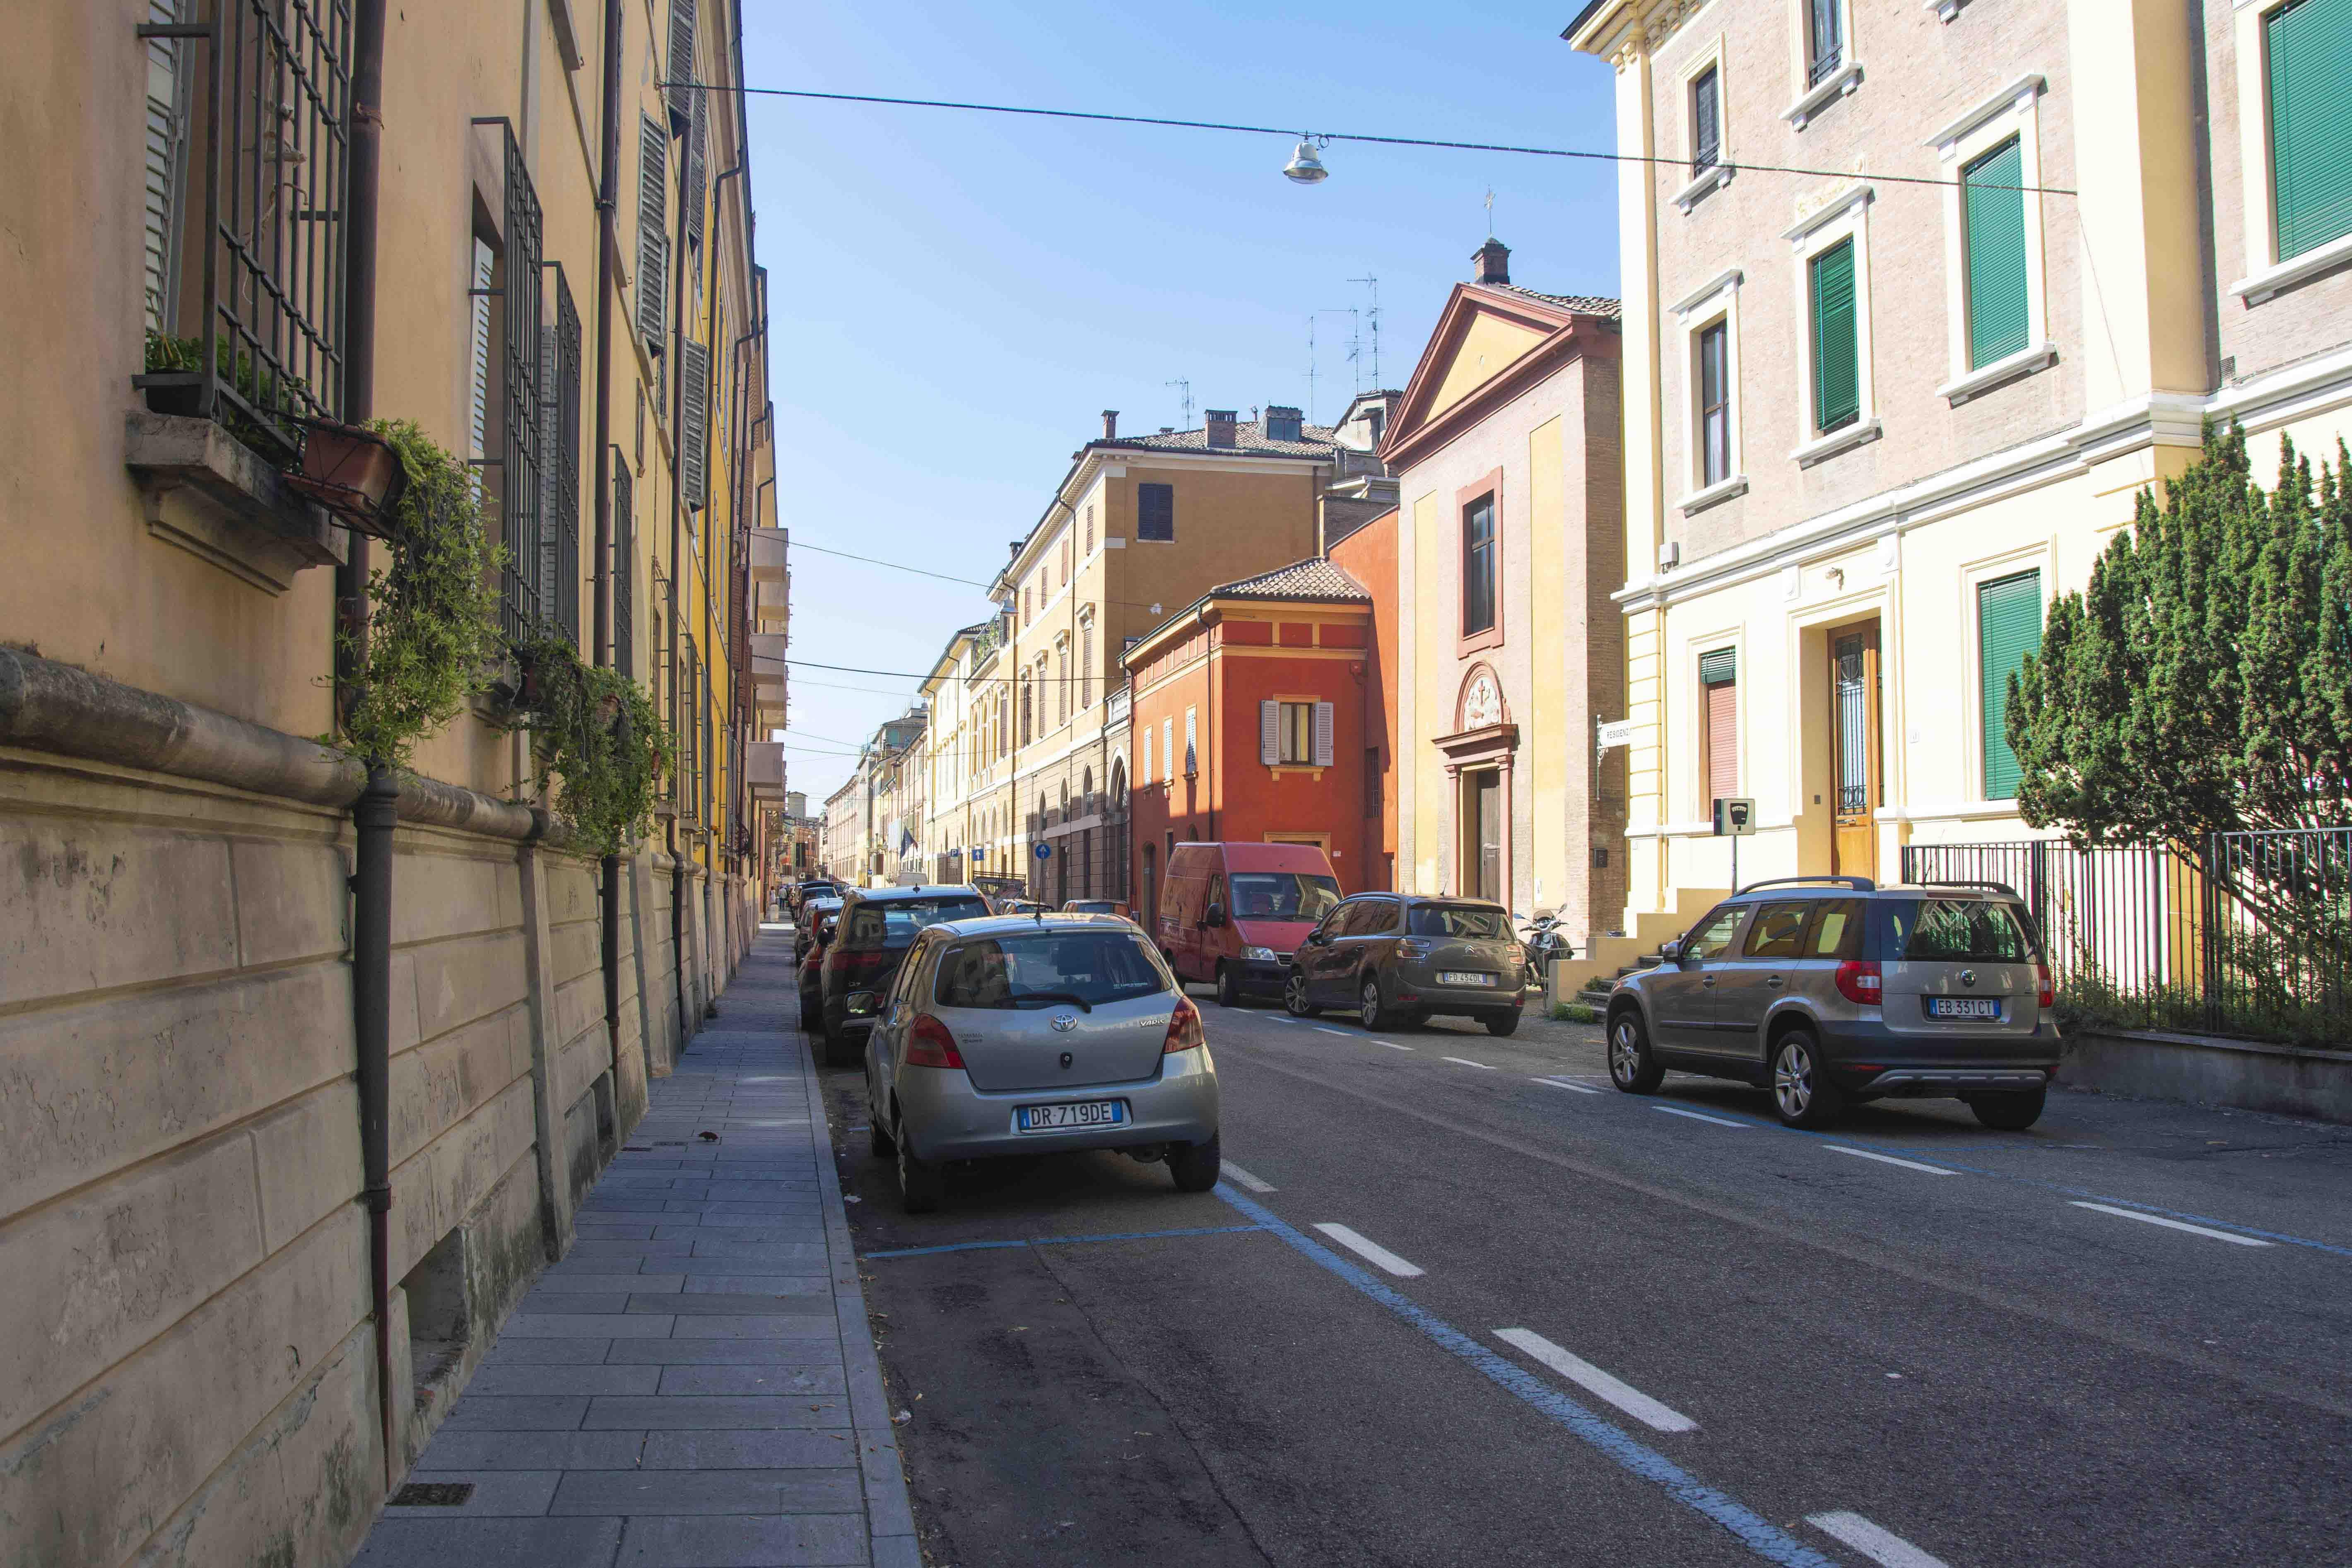 Via Ganaceto, Modena